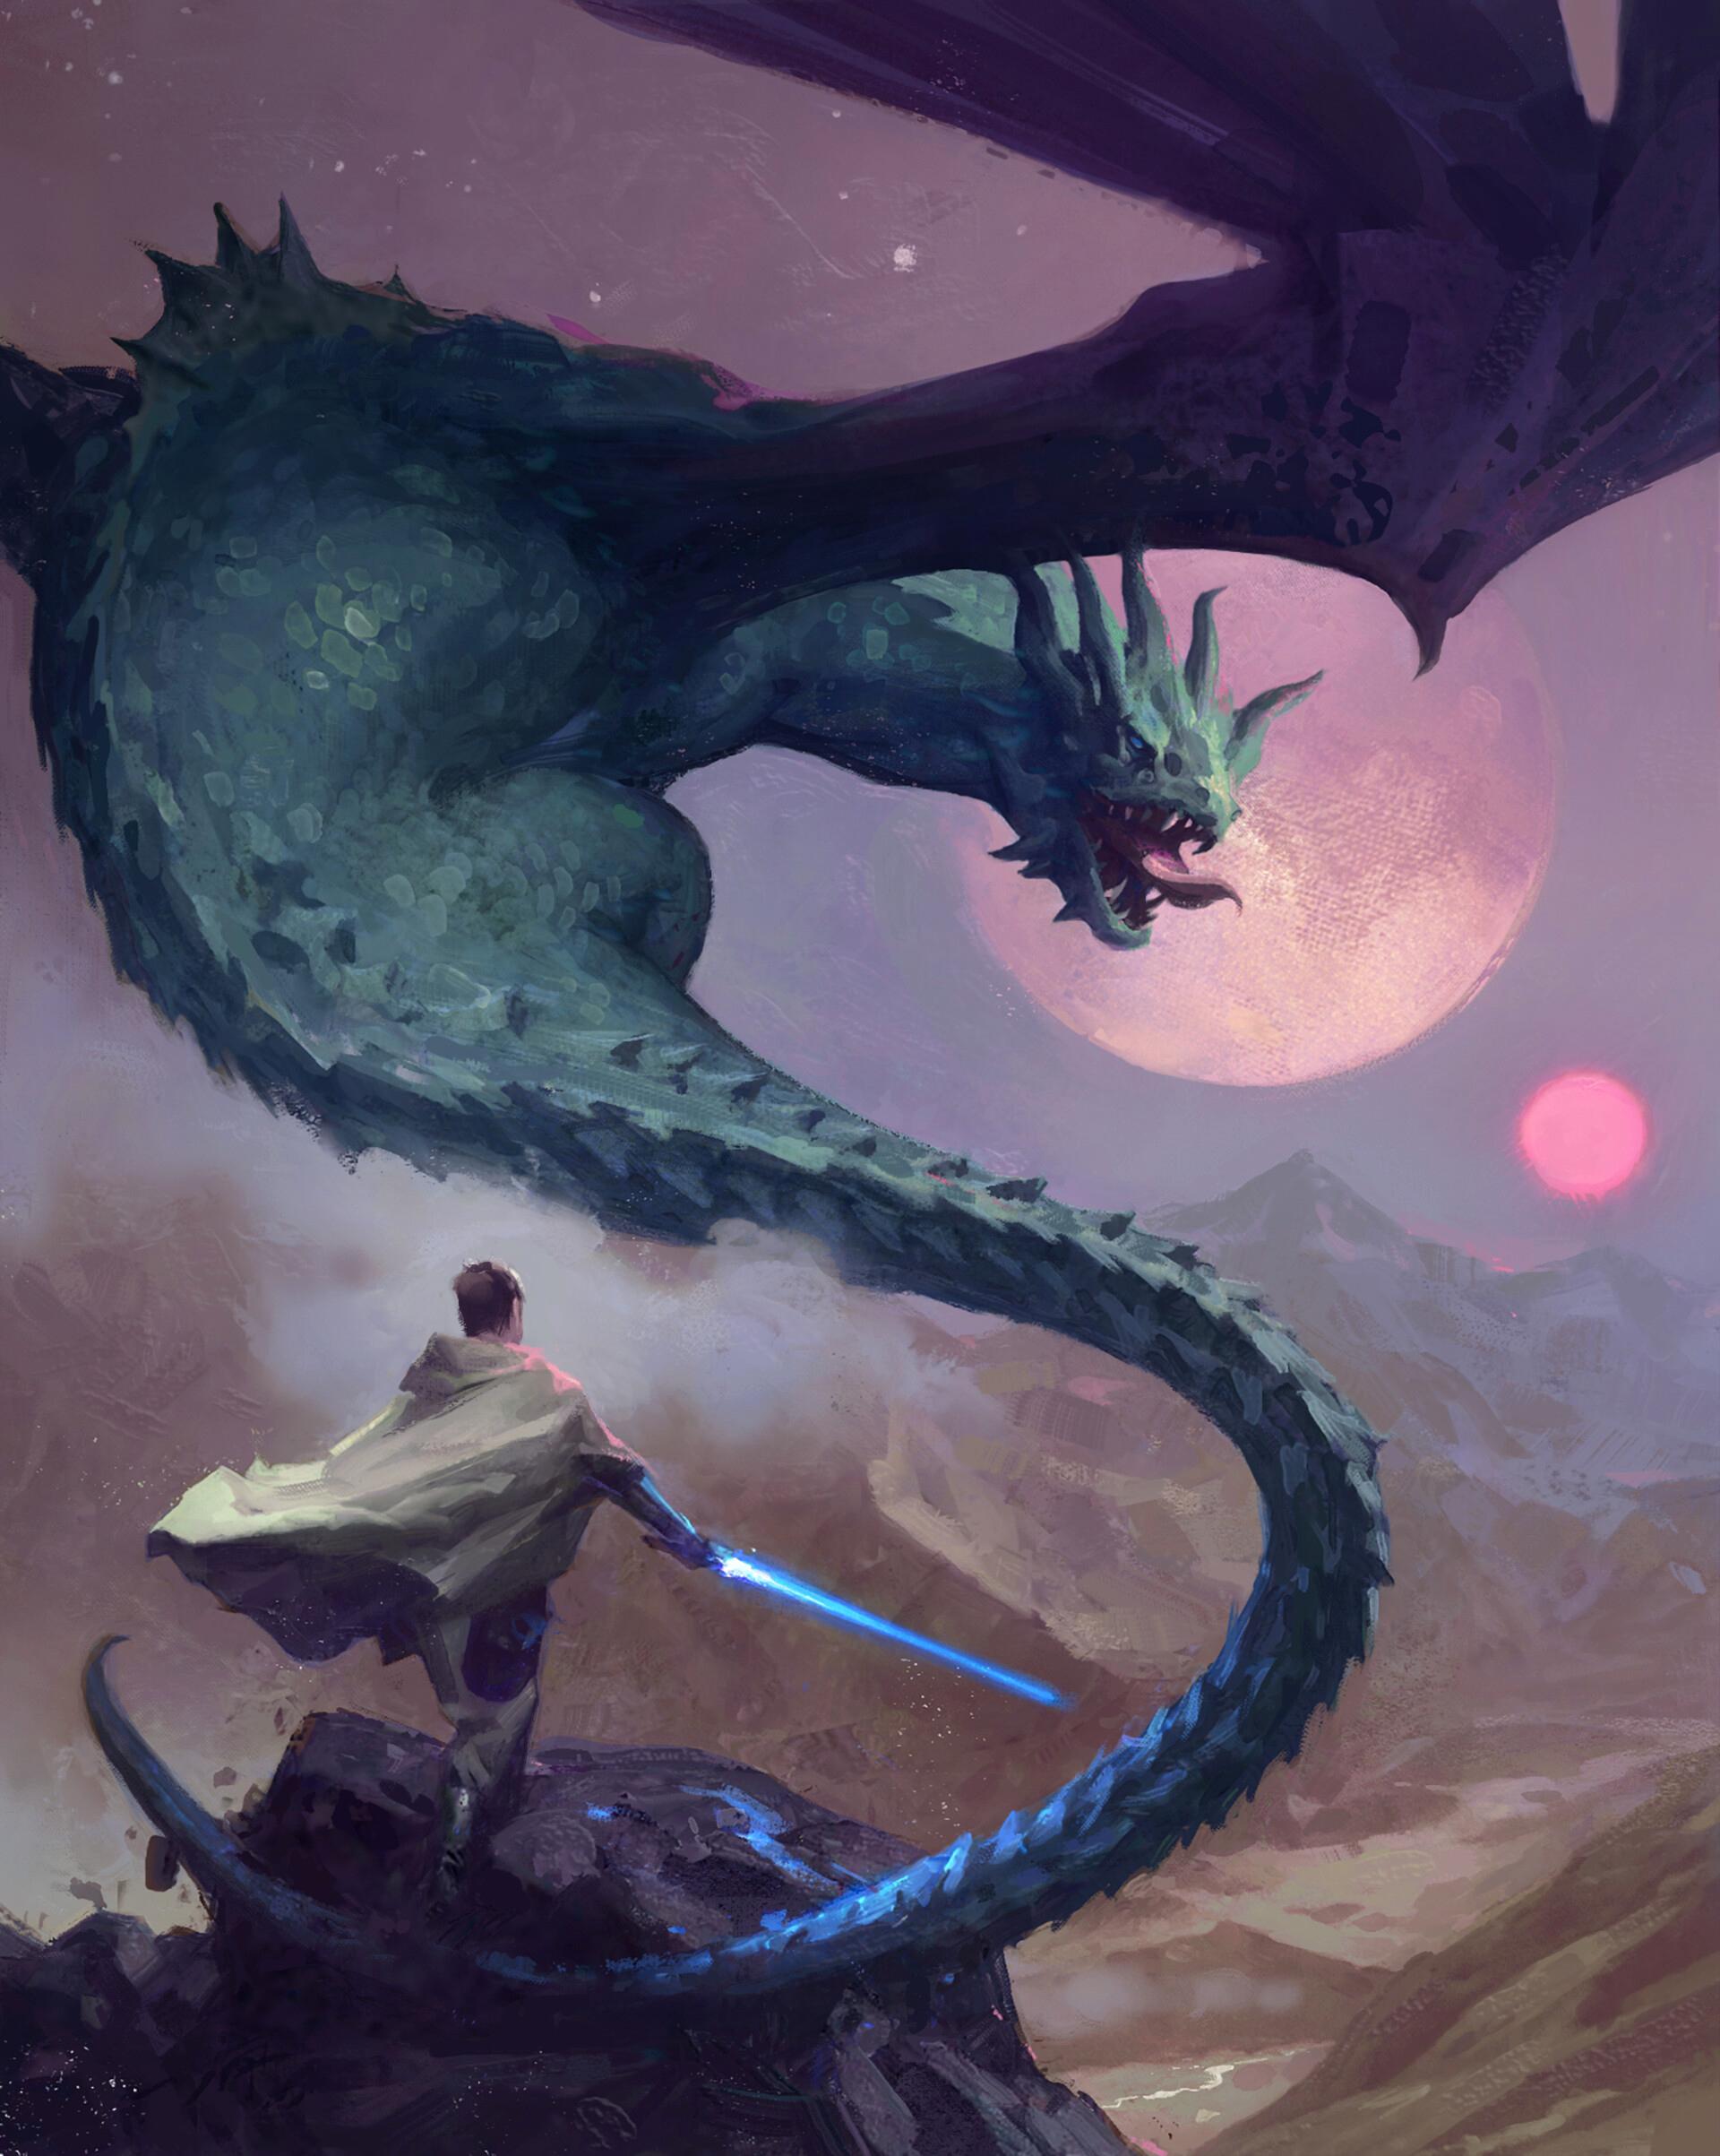 Krayt (krayt dragon)